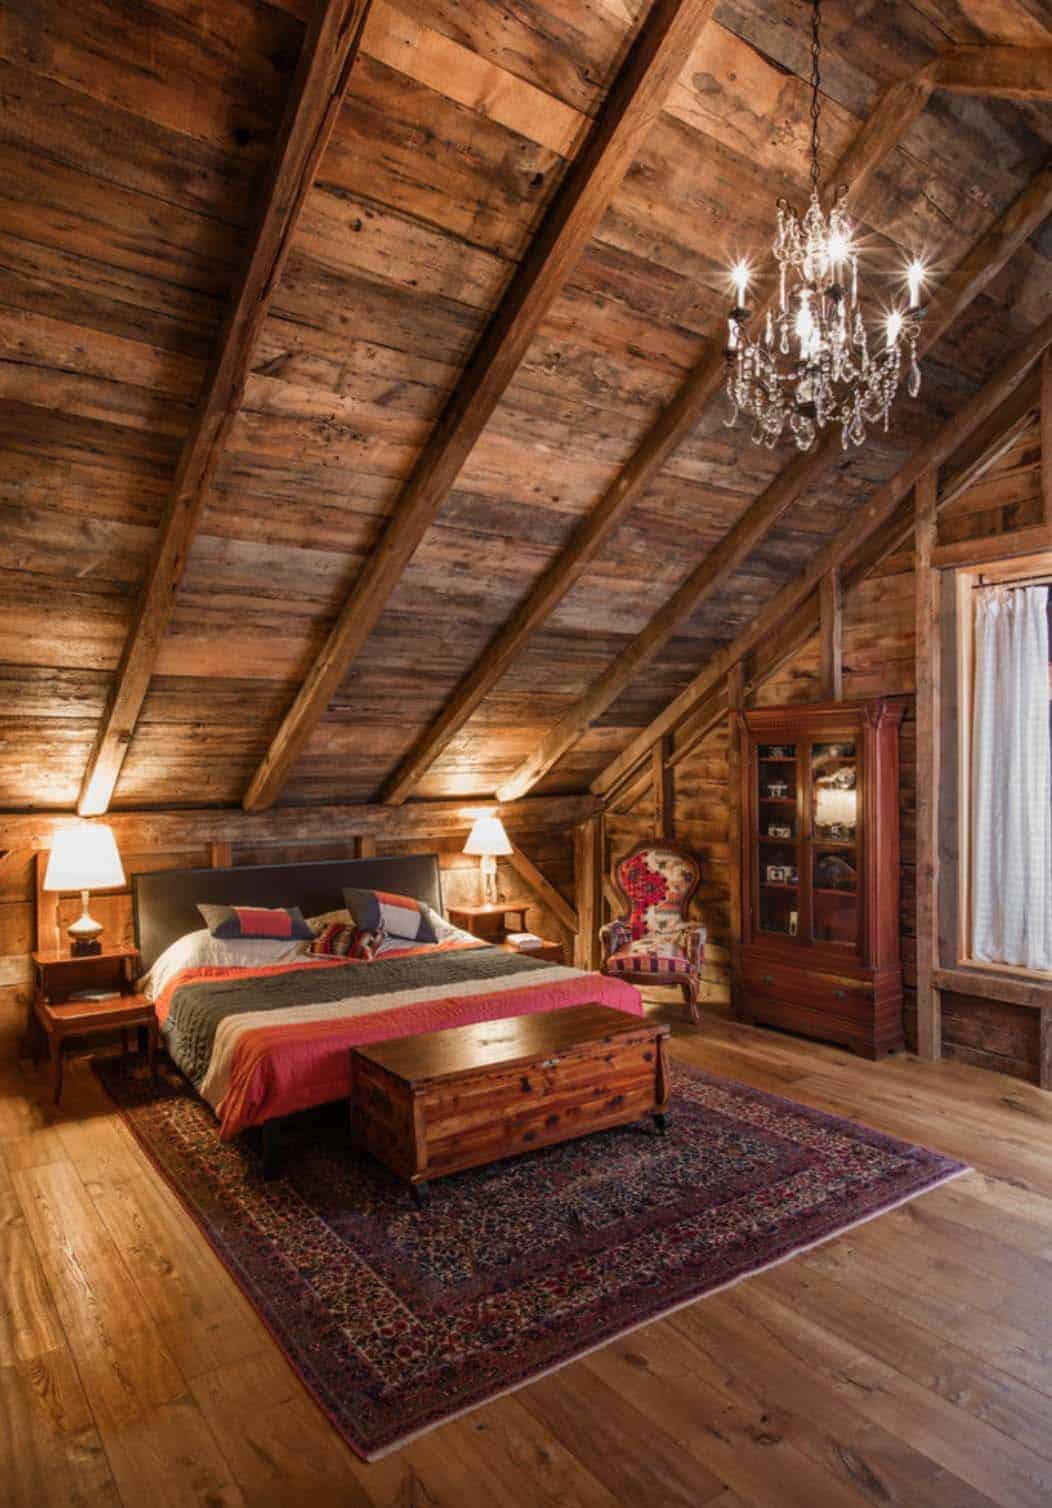 Rustic Barn Guesthouse-Joan Heaton Architects-18-1 Kindesign